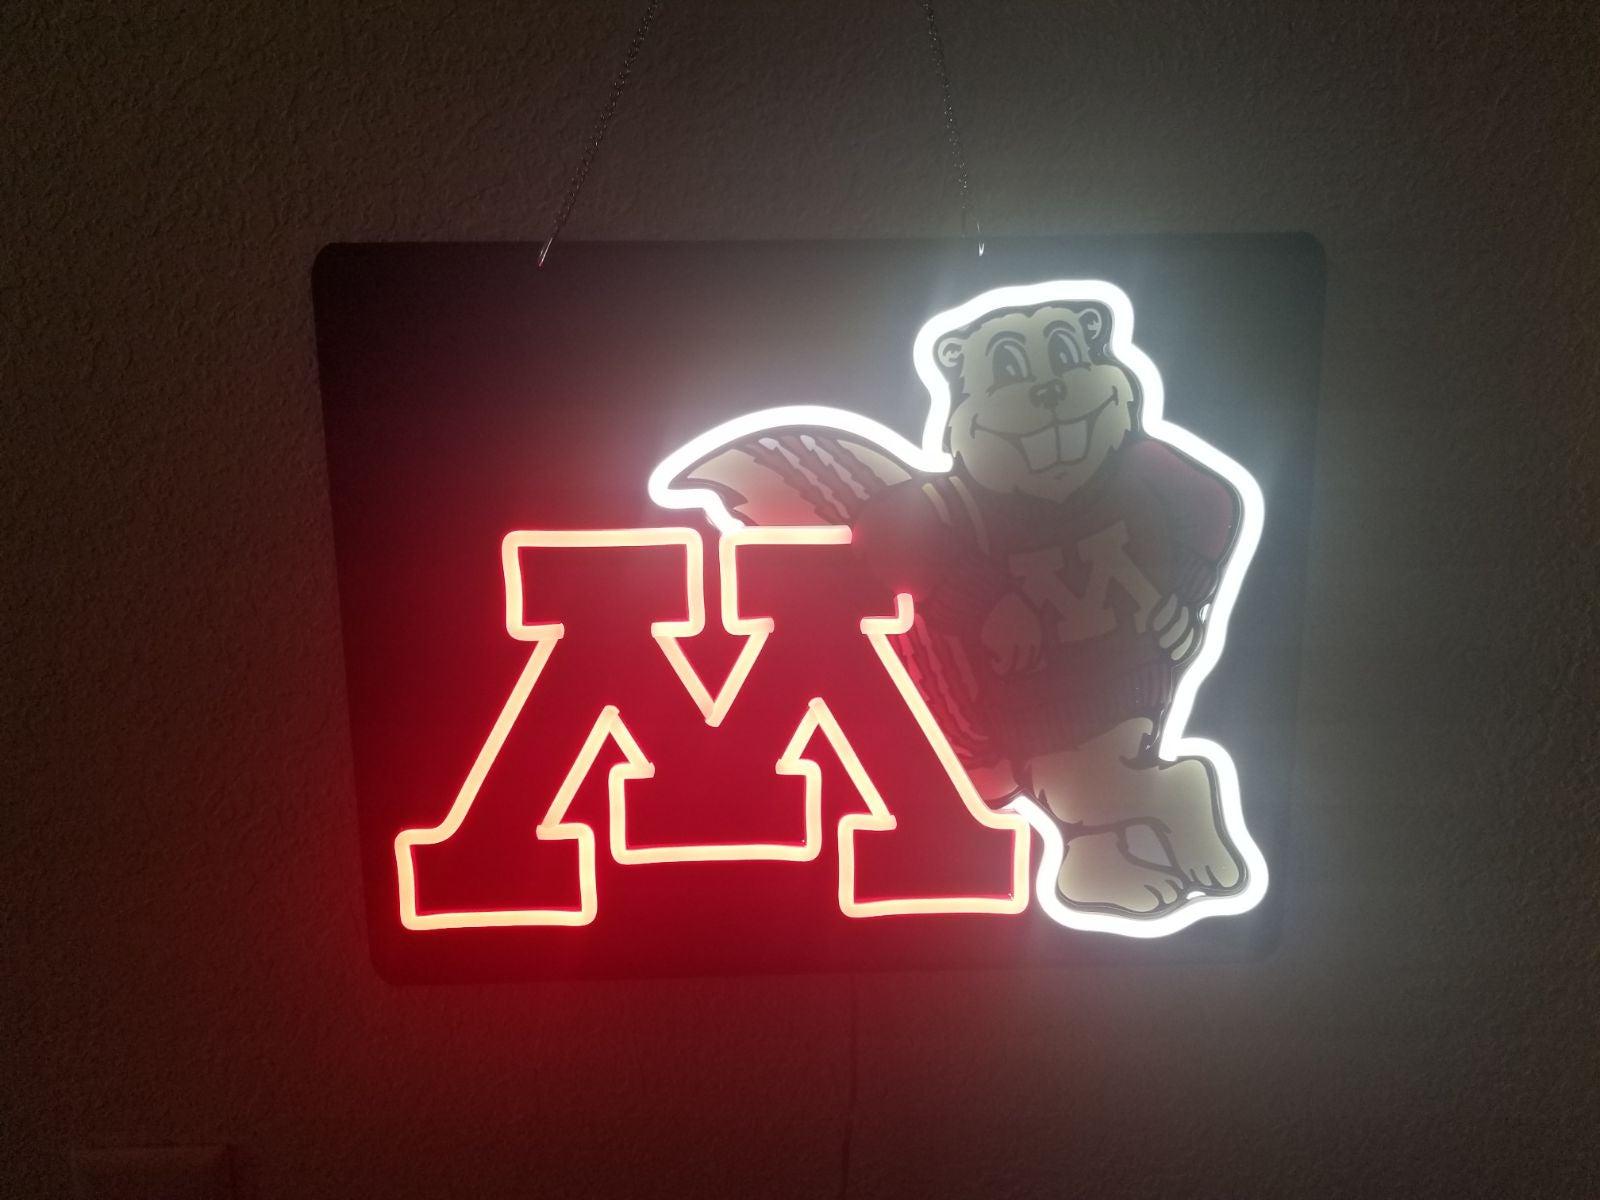 Neon Light - Minnesota Golden Gopher